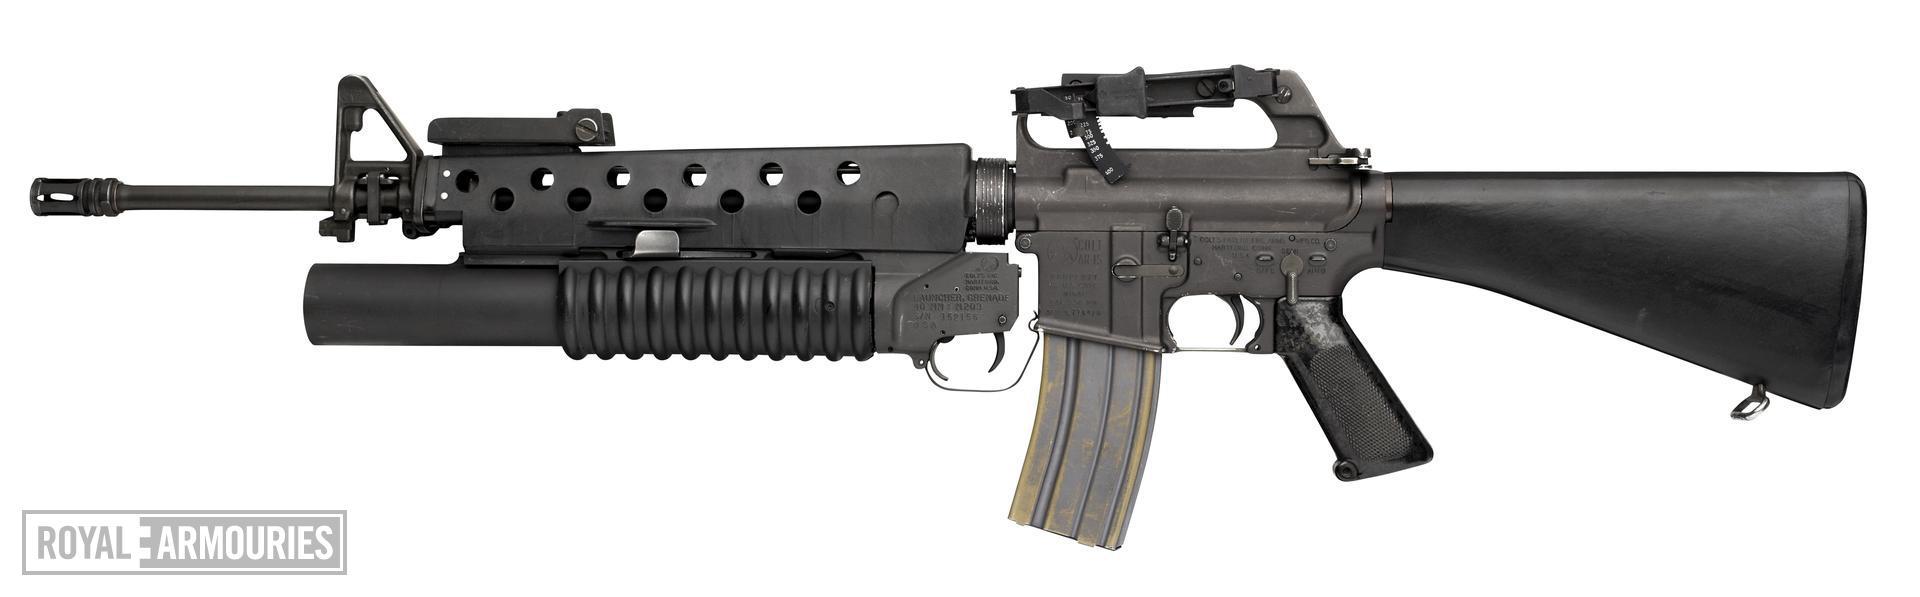 Centrefire automatic rifle - Colt Armalite M16A1